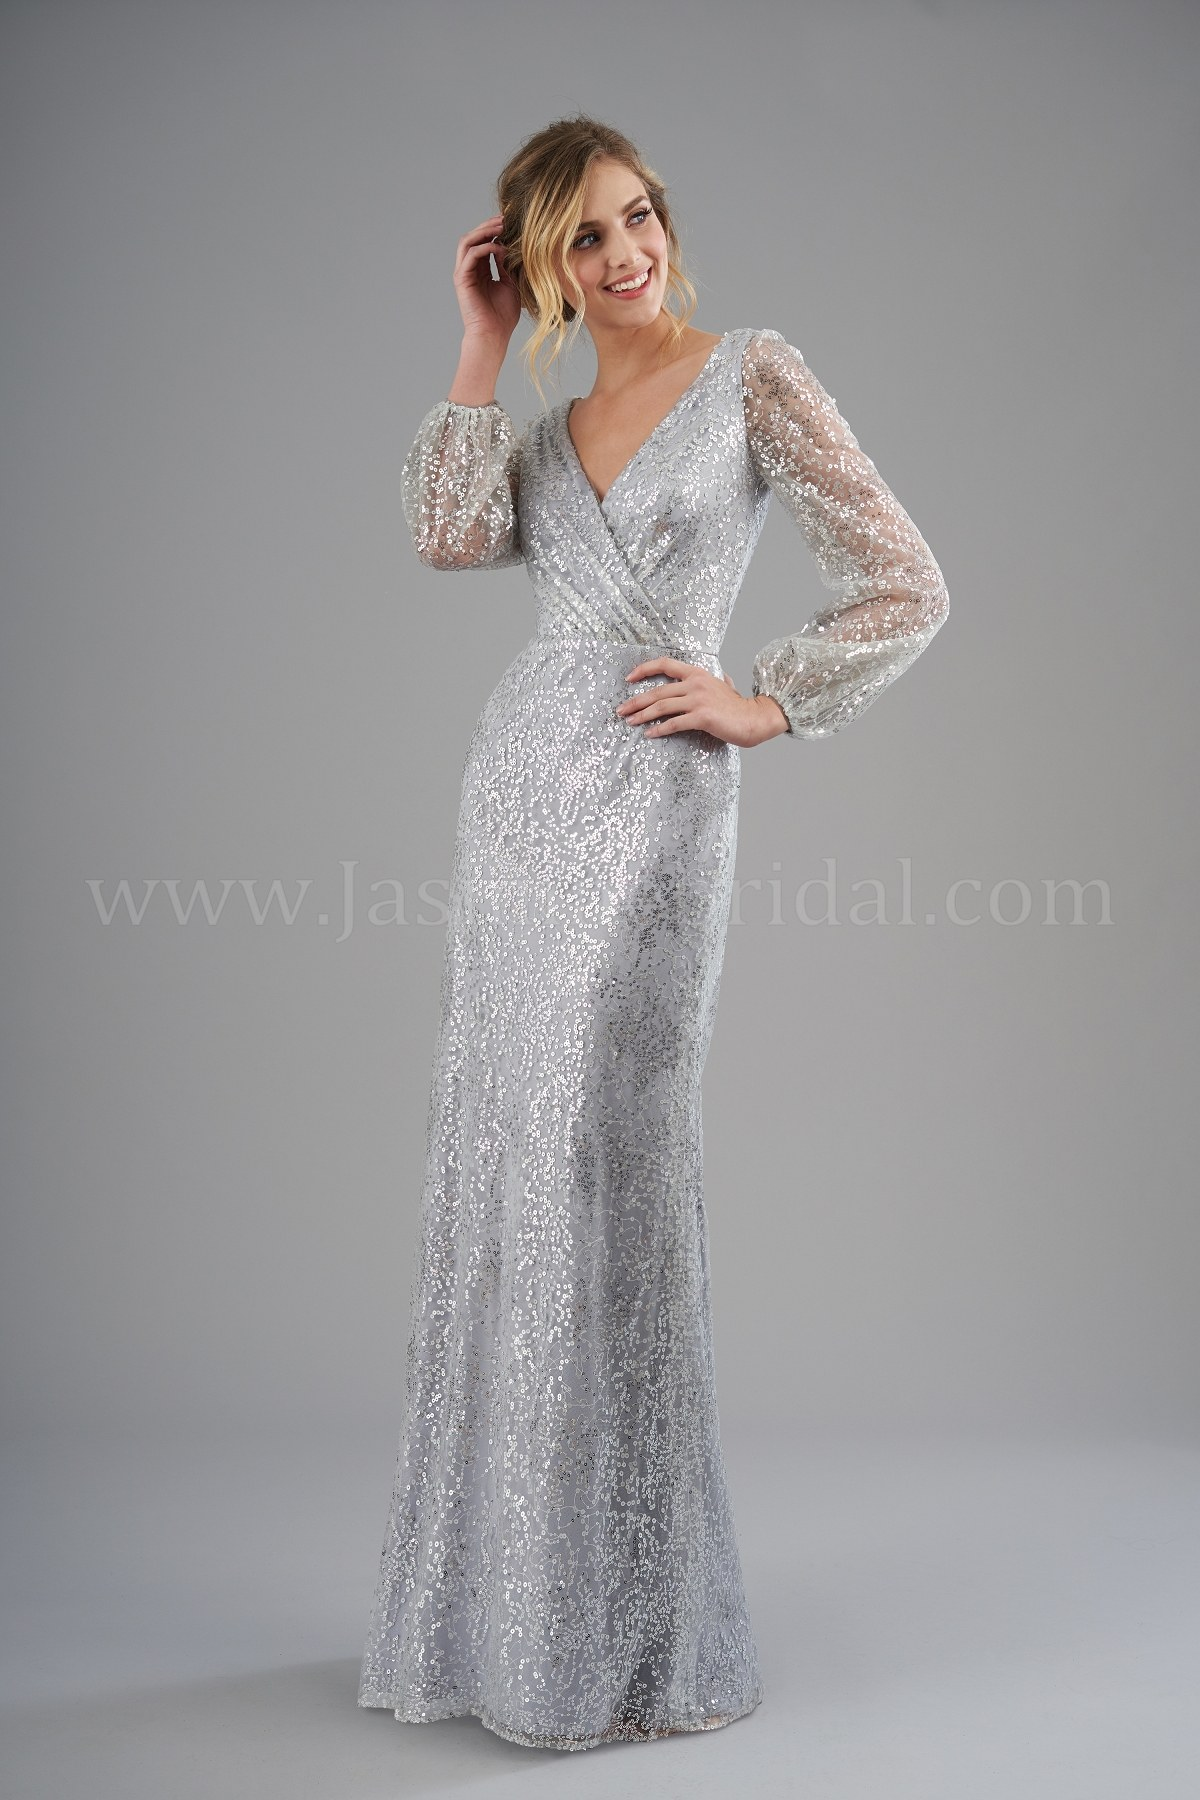 76315b6778e B203062 V-neck Brushed Sequin Long Bridesmaid Dress